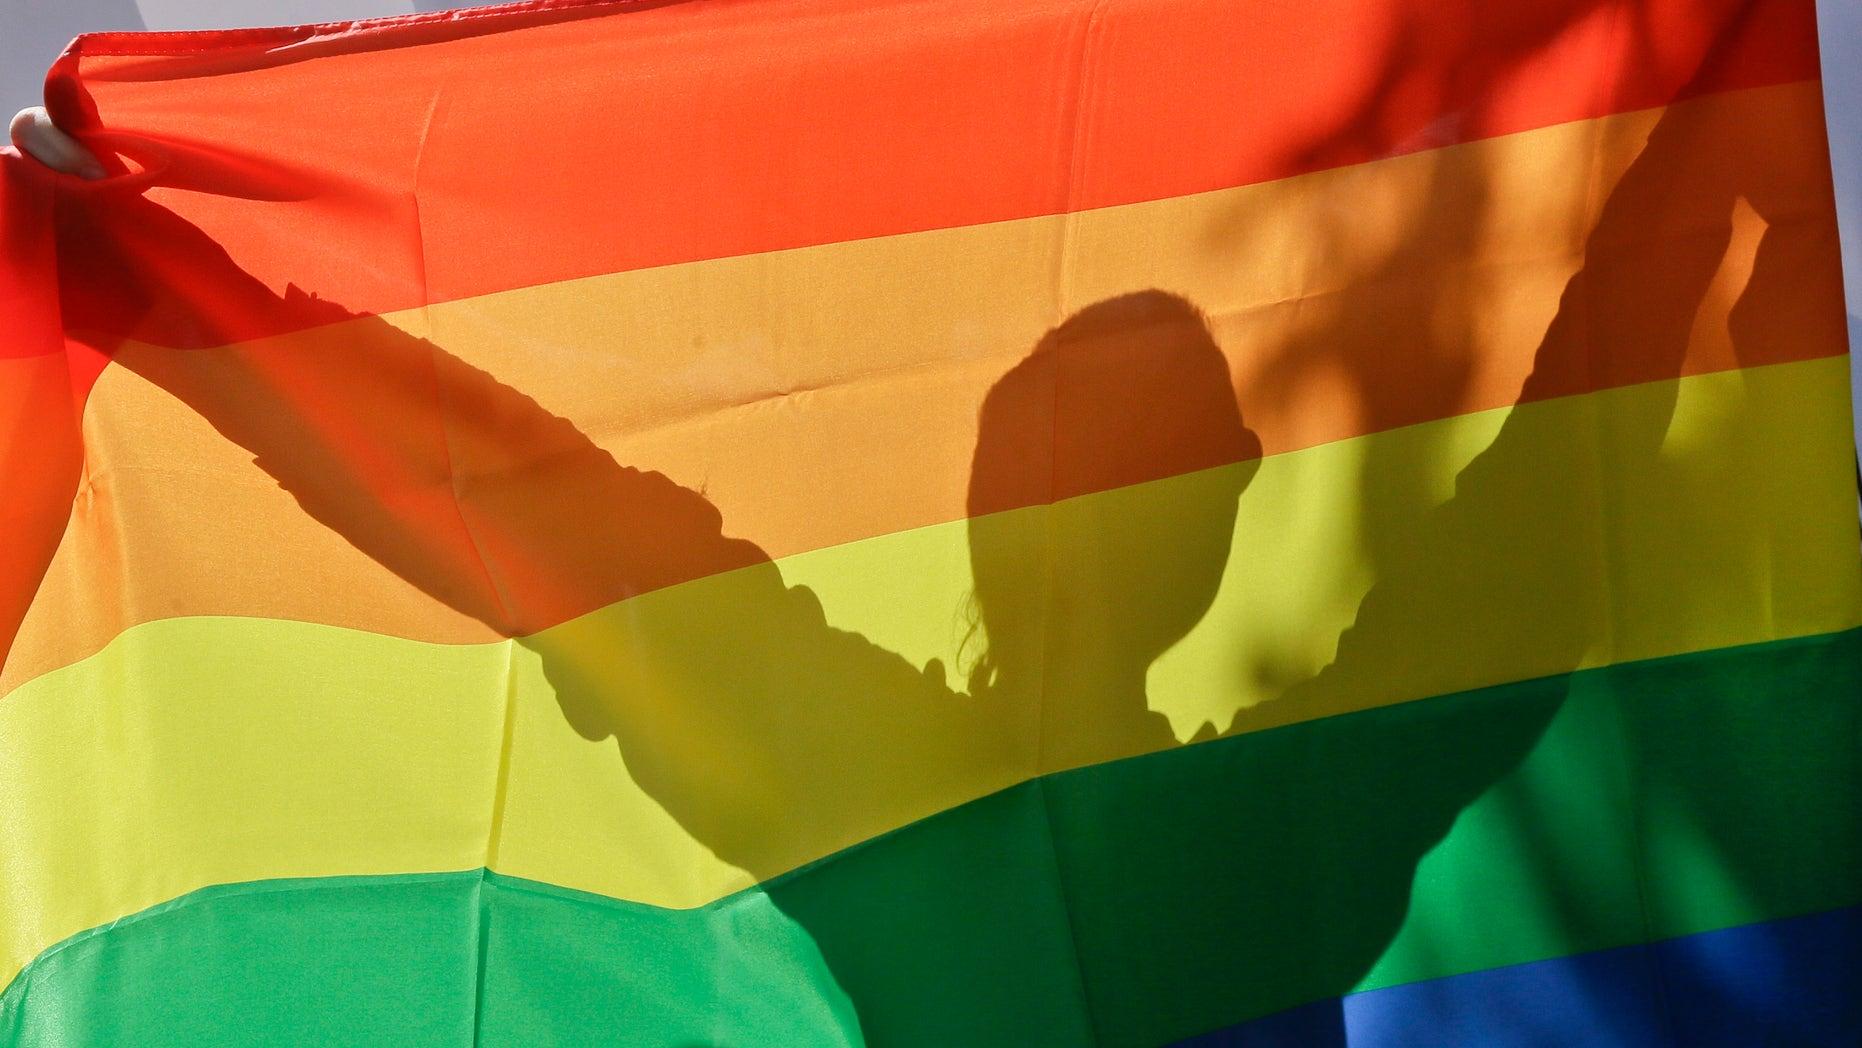 An activist in Ukraine's first gay pride demonstration seen through the rainbow flag in Kiev, Ukraine, May 25, 2013. (AP Photo/Efrem Lukatsky)